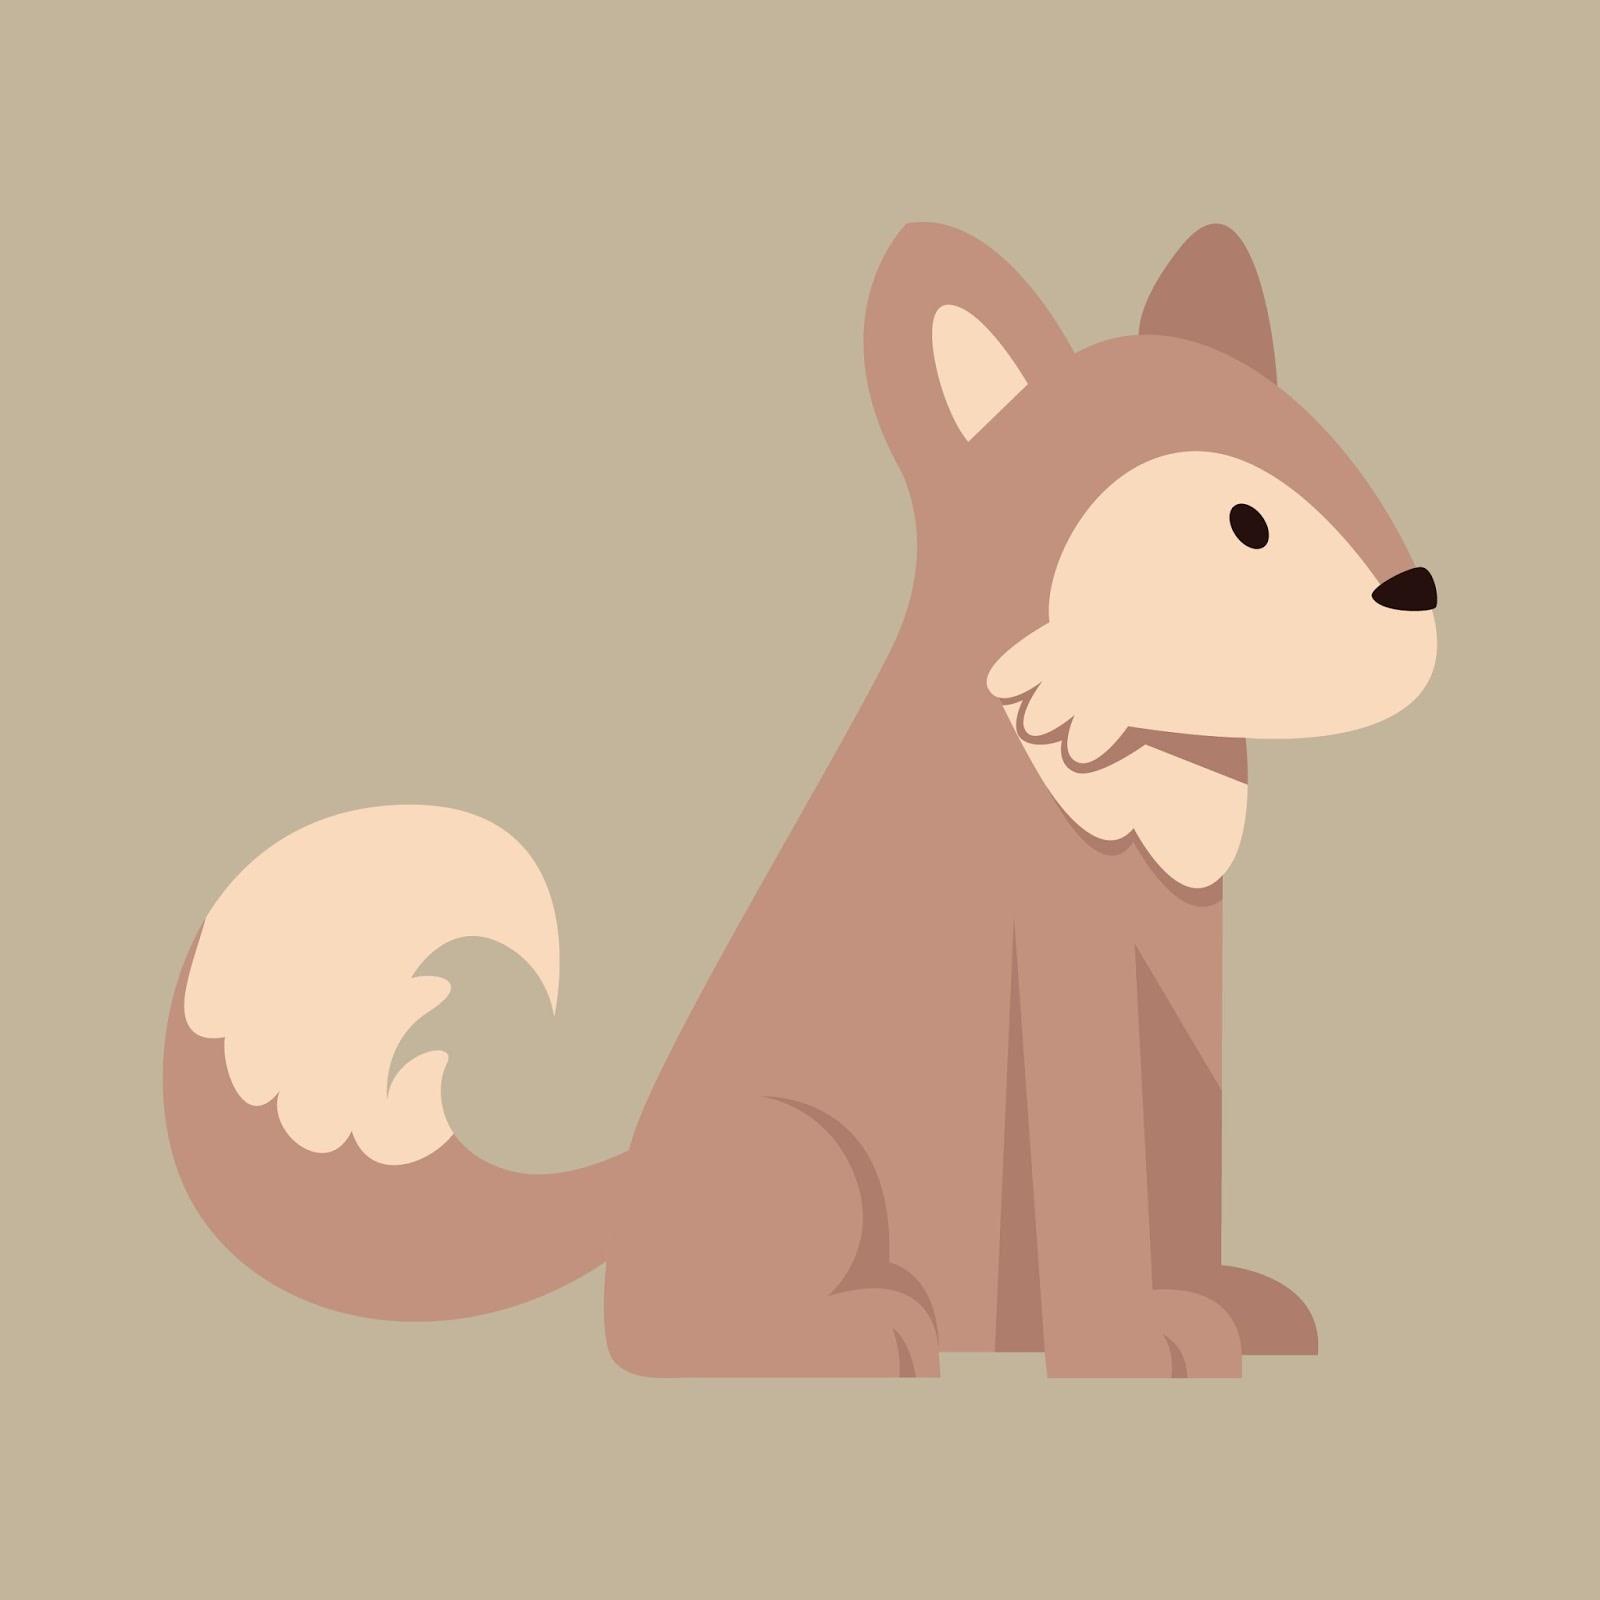 clipart clip art cute dog vector free download husky dog [ 1600 x 1600 Pixel ]